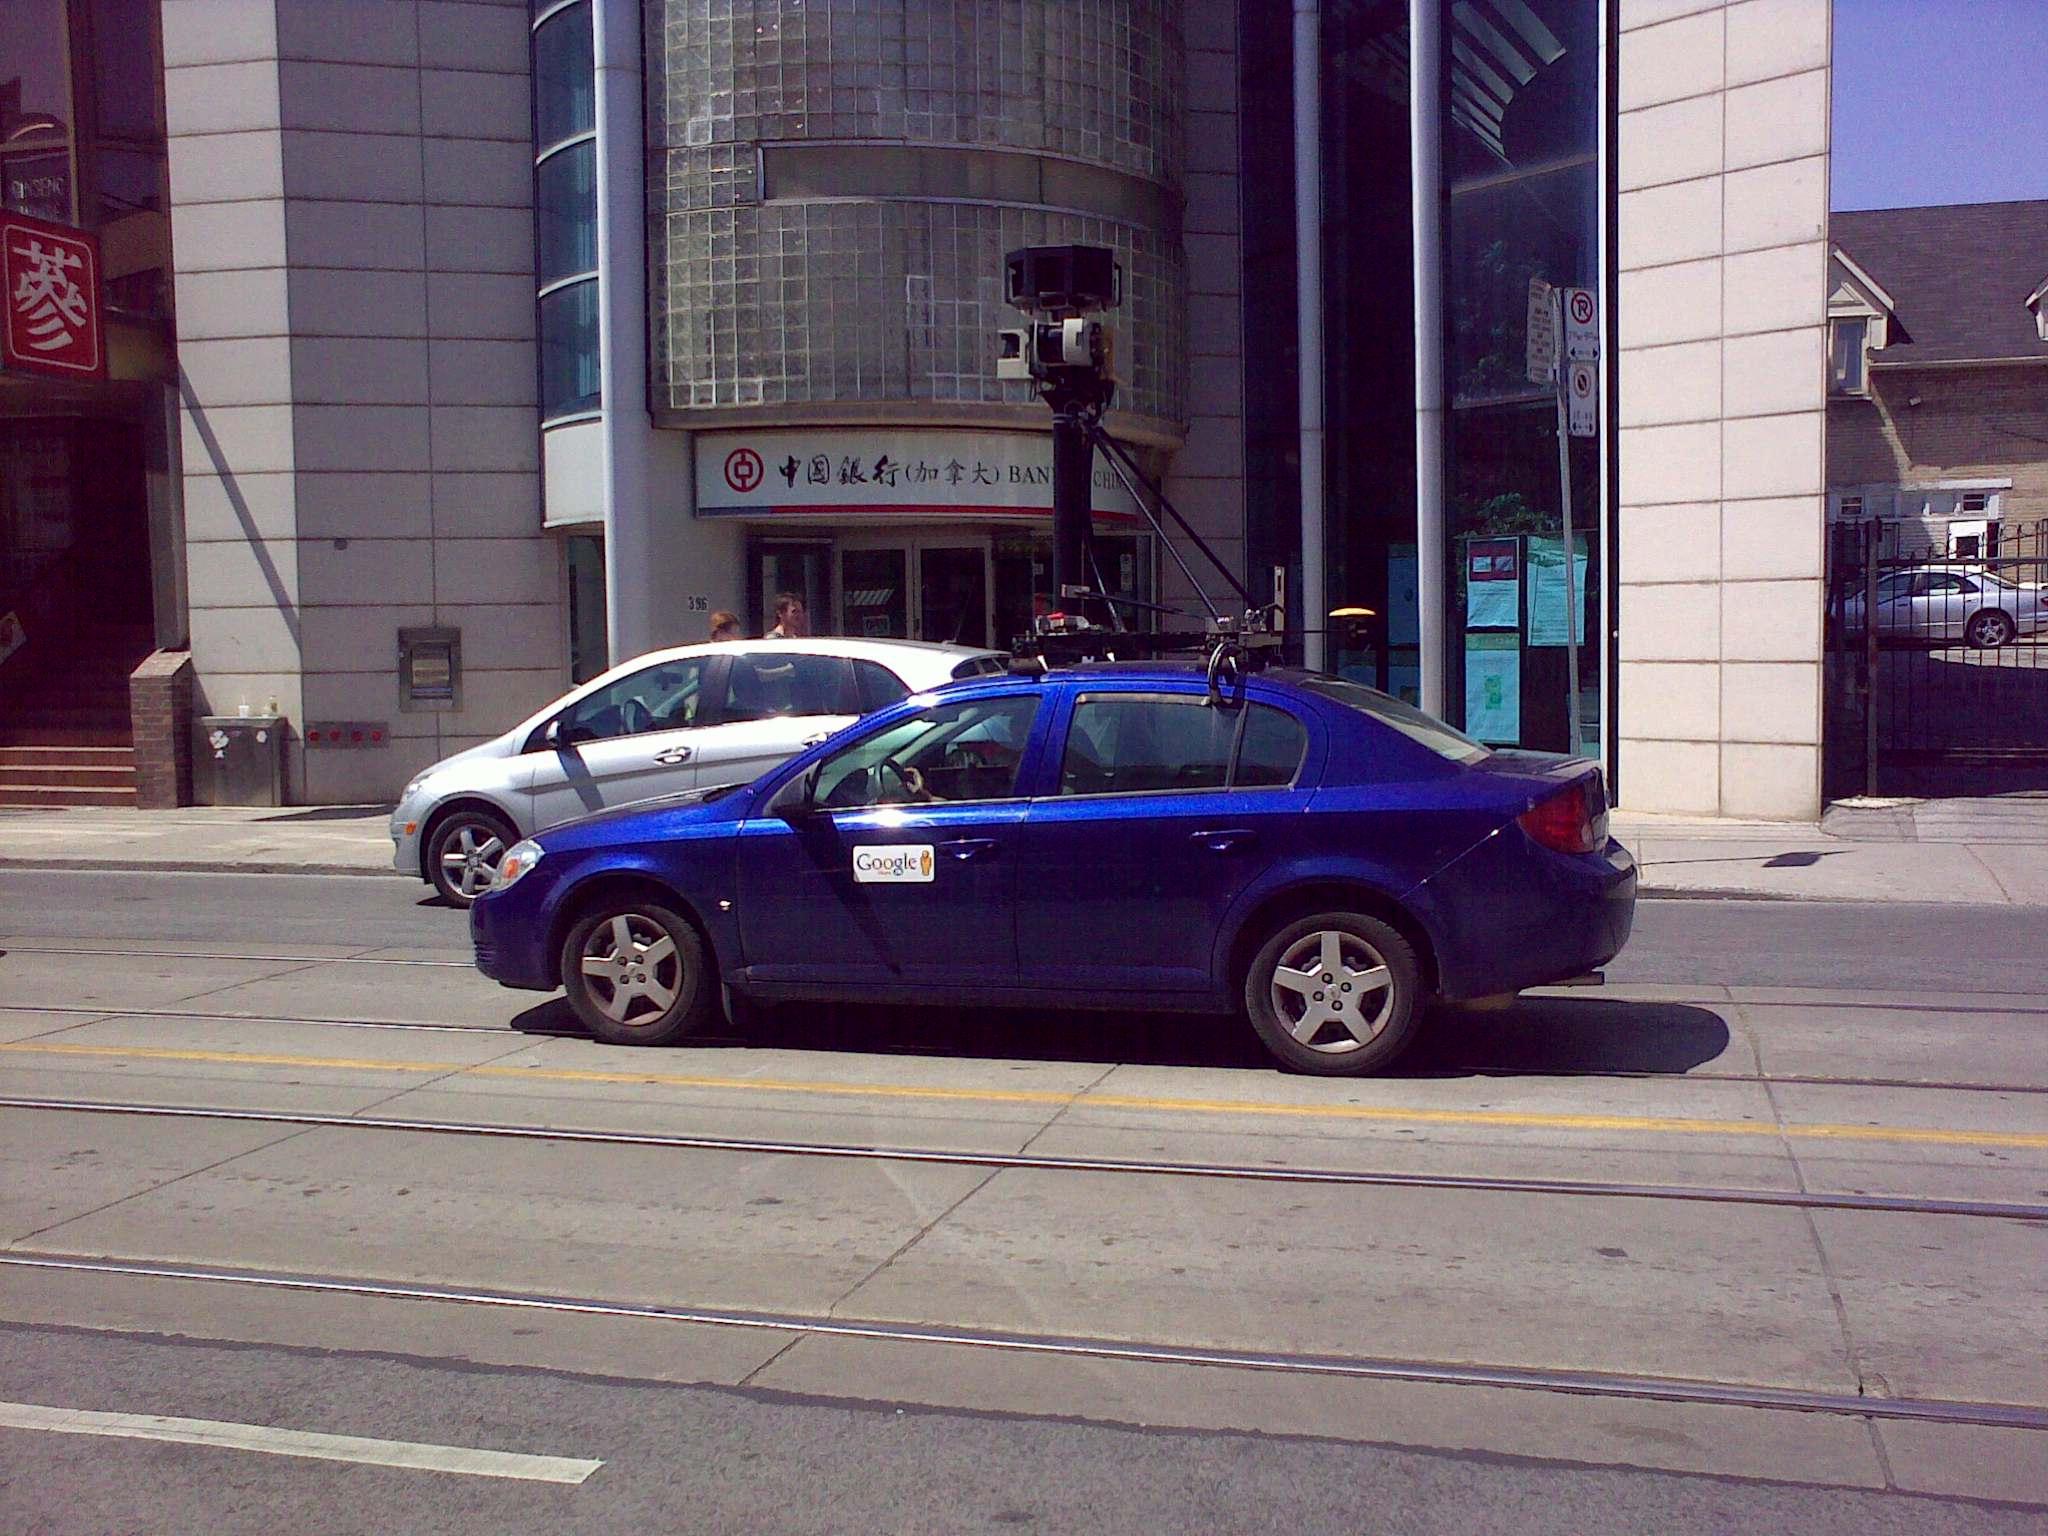 Google Street View in Canada - Wikipedia